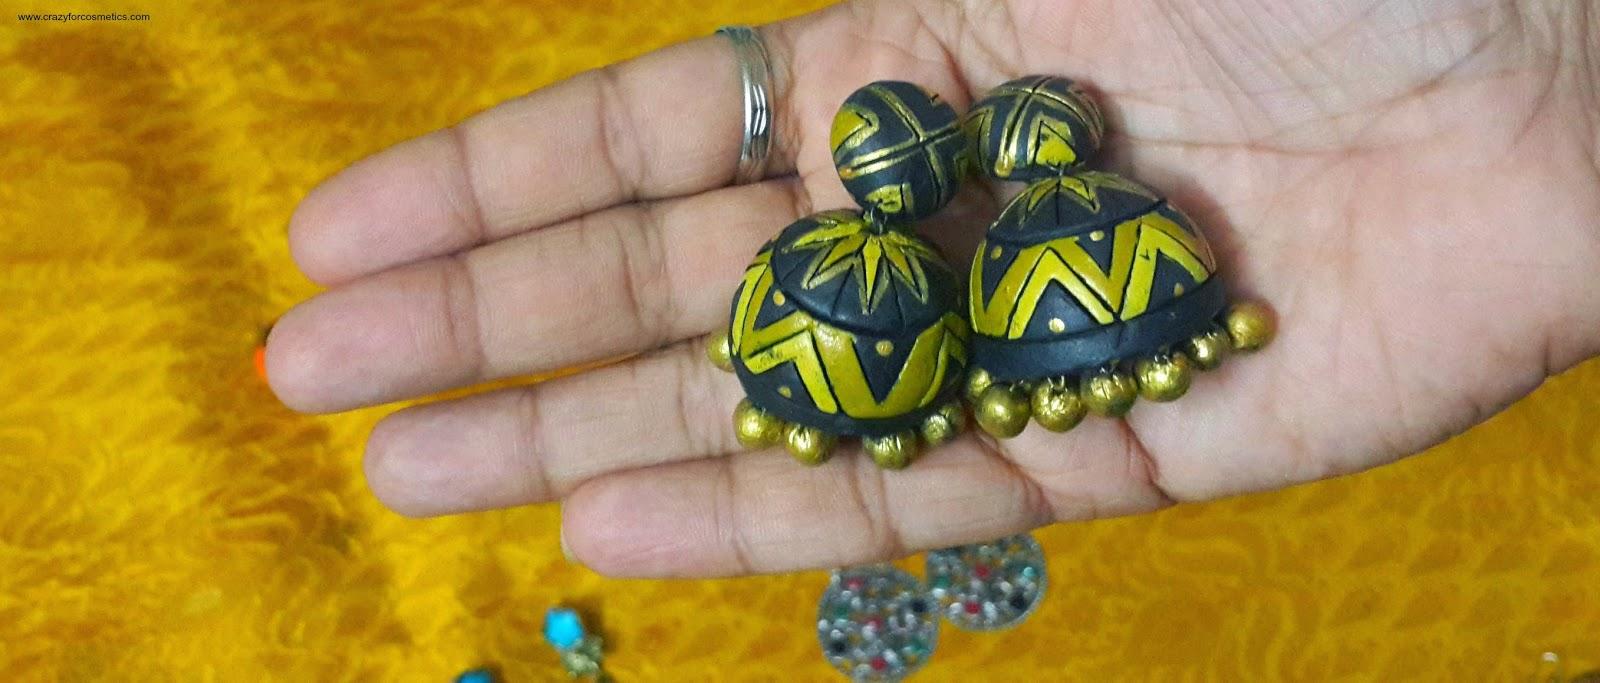 indian traditional jewellery-indian traditional jhumkas-south indian traditional jhumkas-indian traditional gold jhumkas-chand bali earrings- Indian jewelery